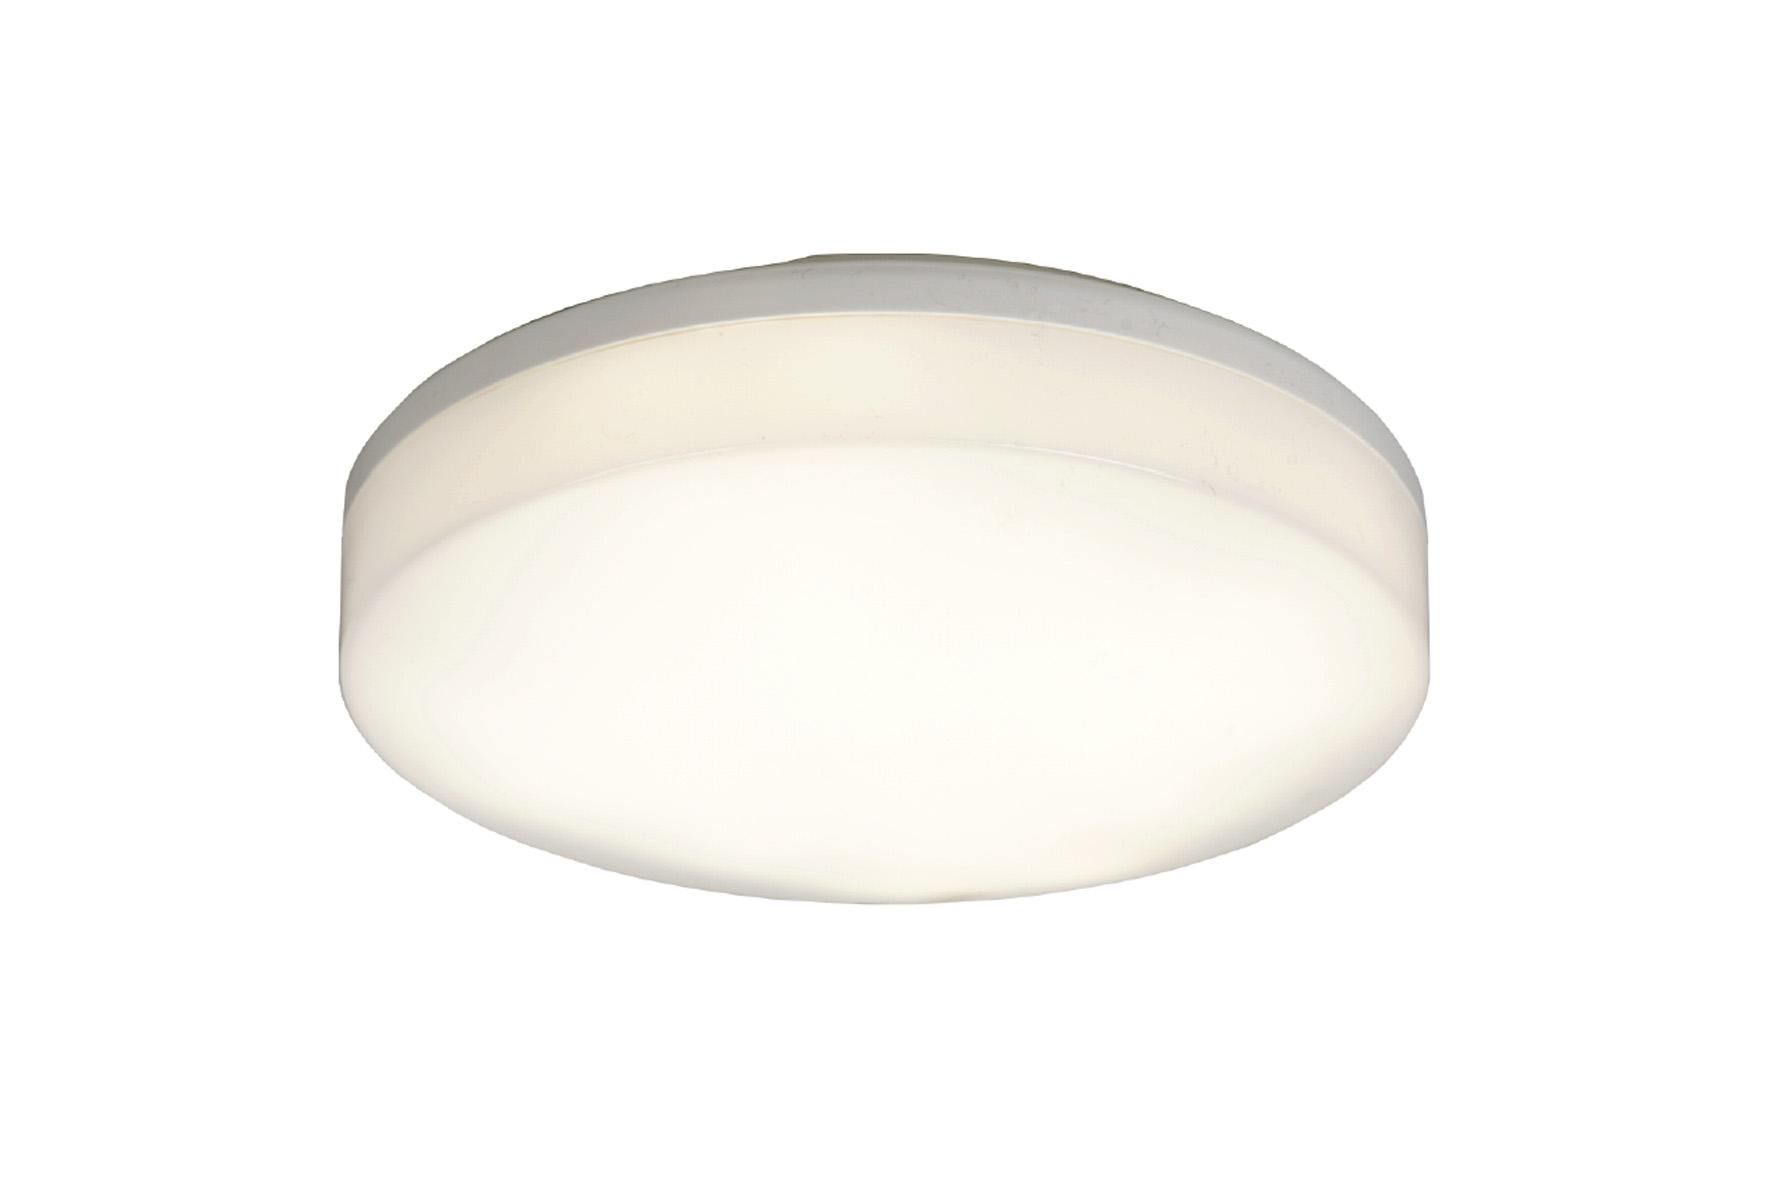 luminaire orbital led achat en ligne ou dans notre magasin. Black Bedroom Furniture Sets. Home Design Ideas